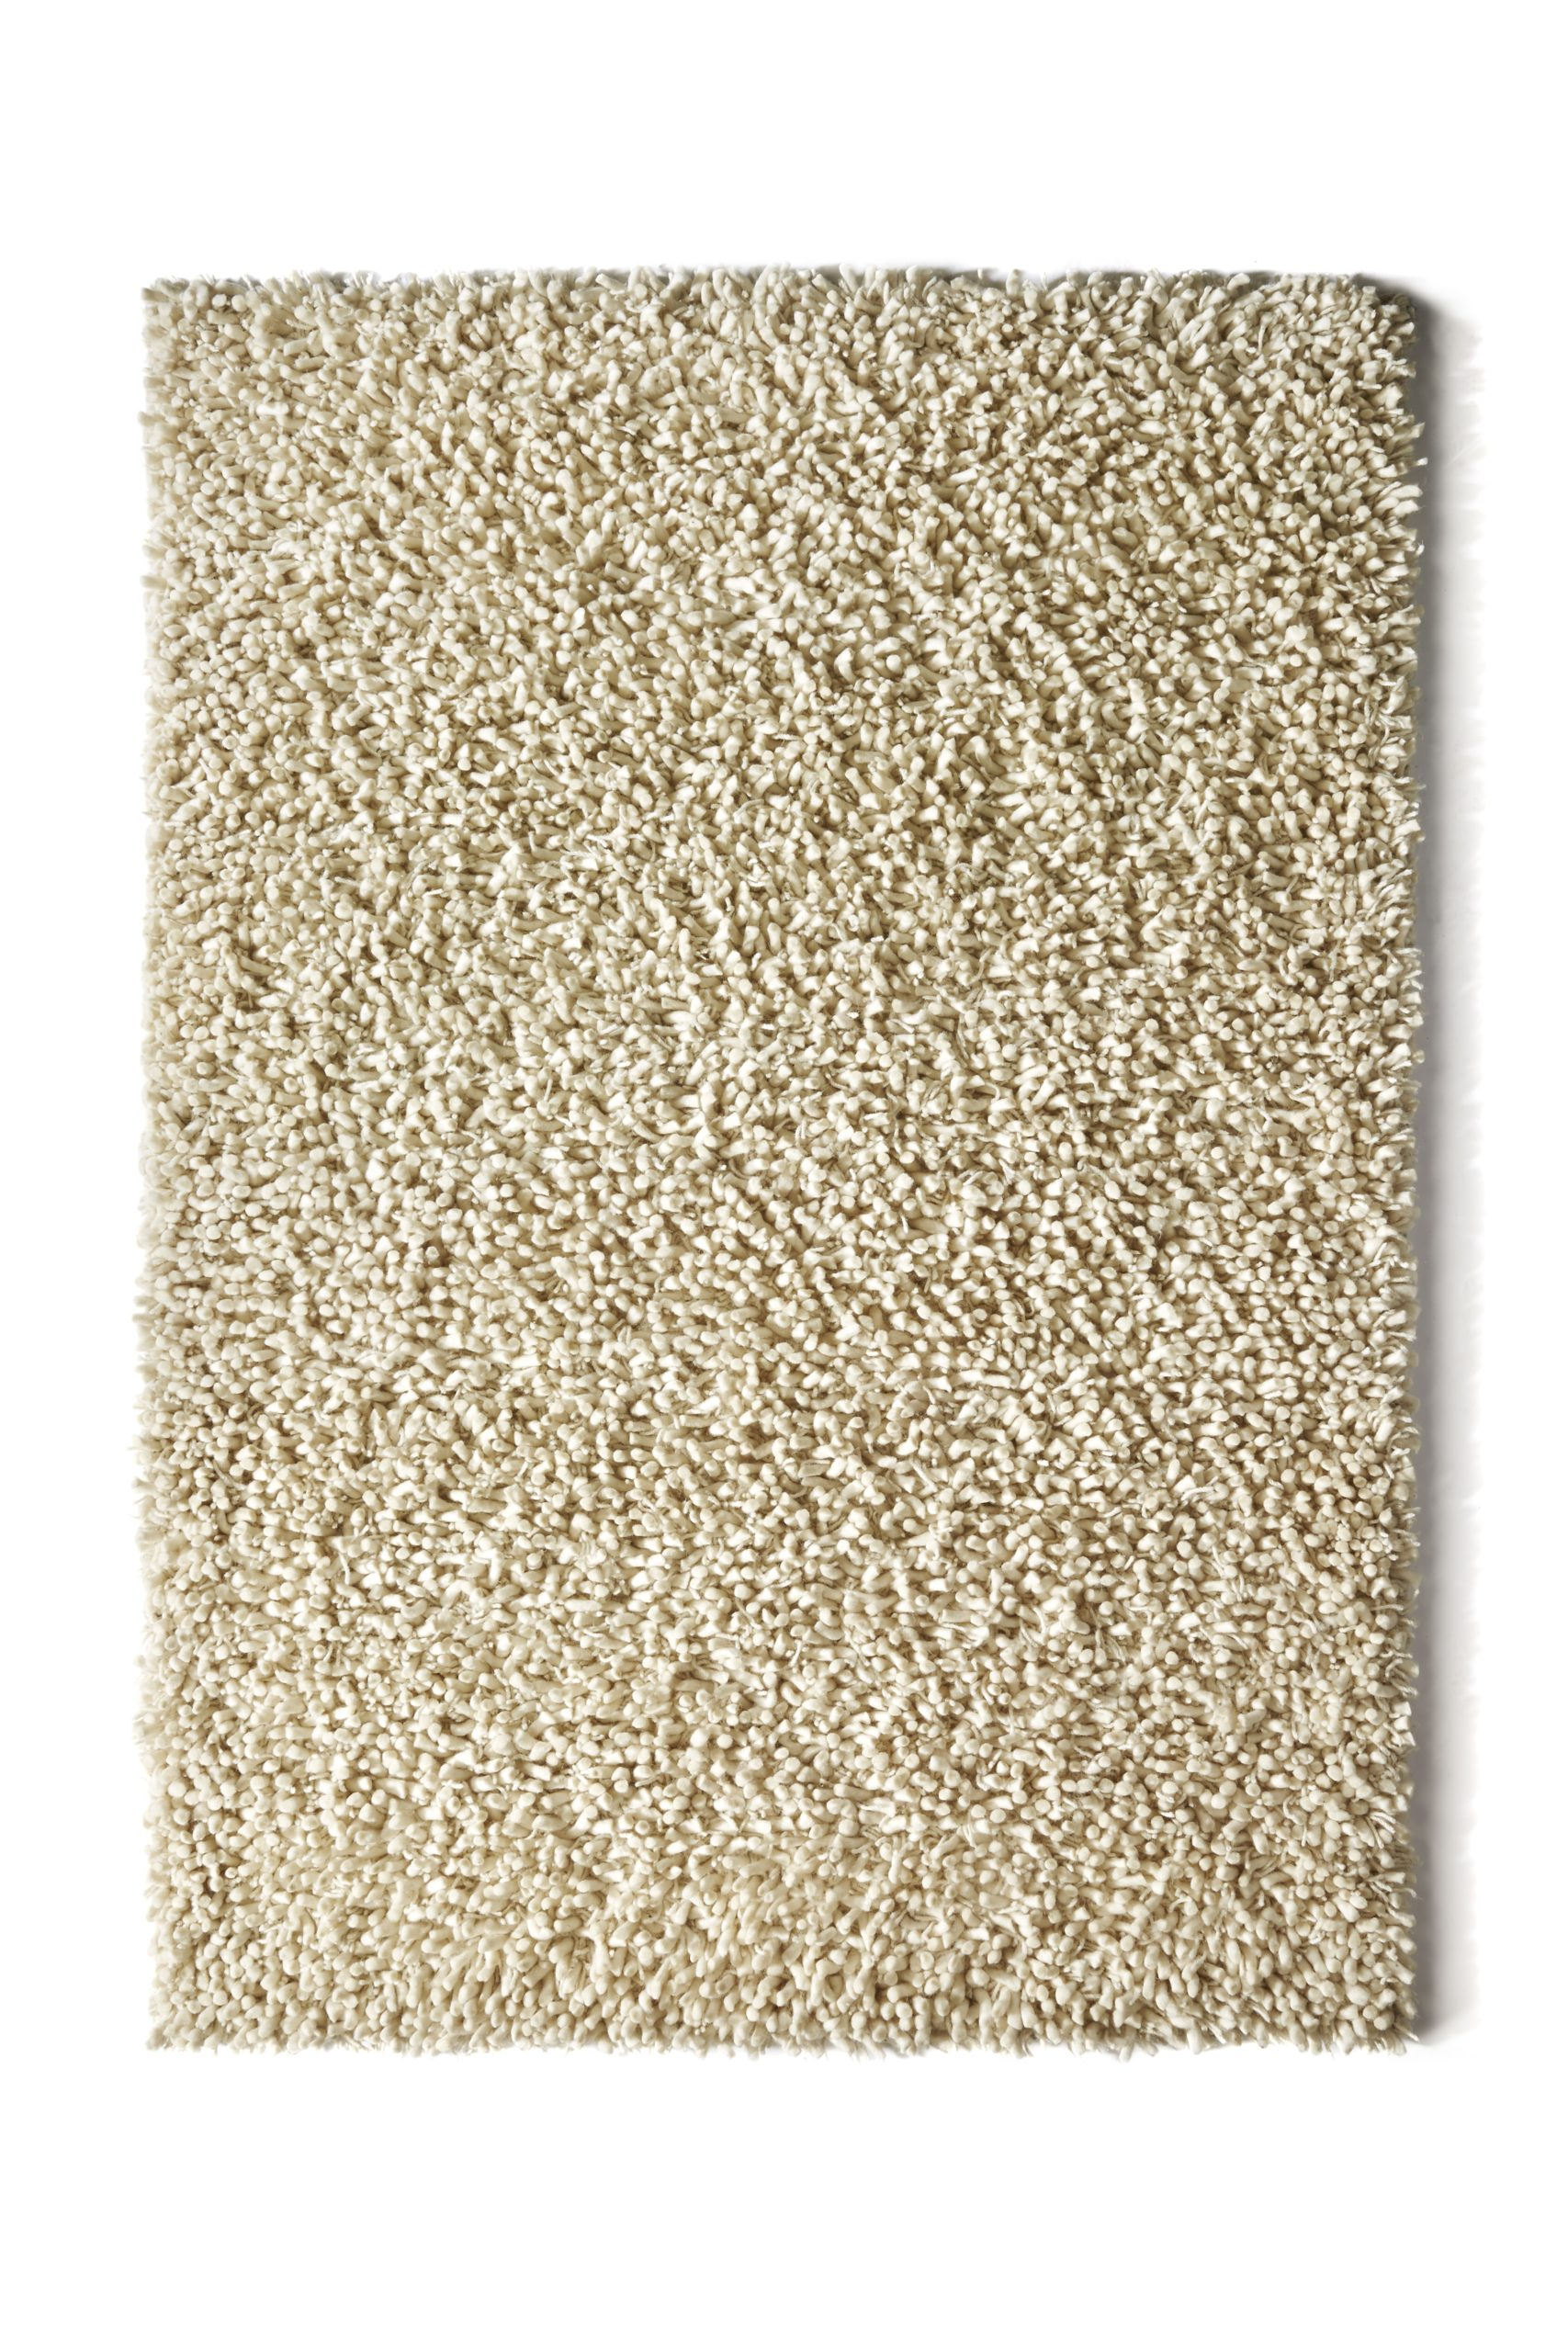 Sample of Firth Carpets Portland range rug